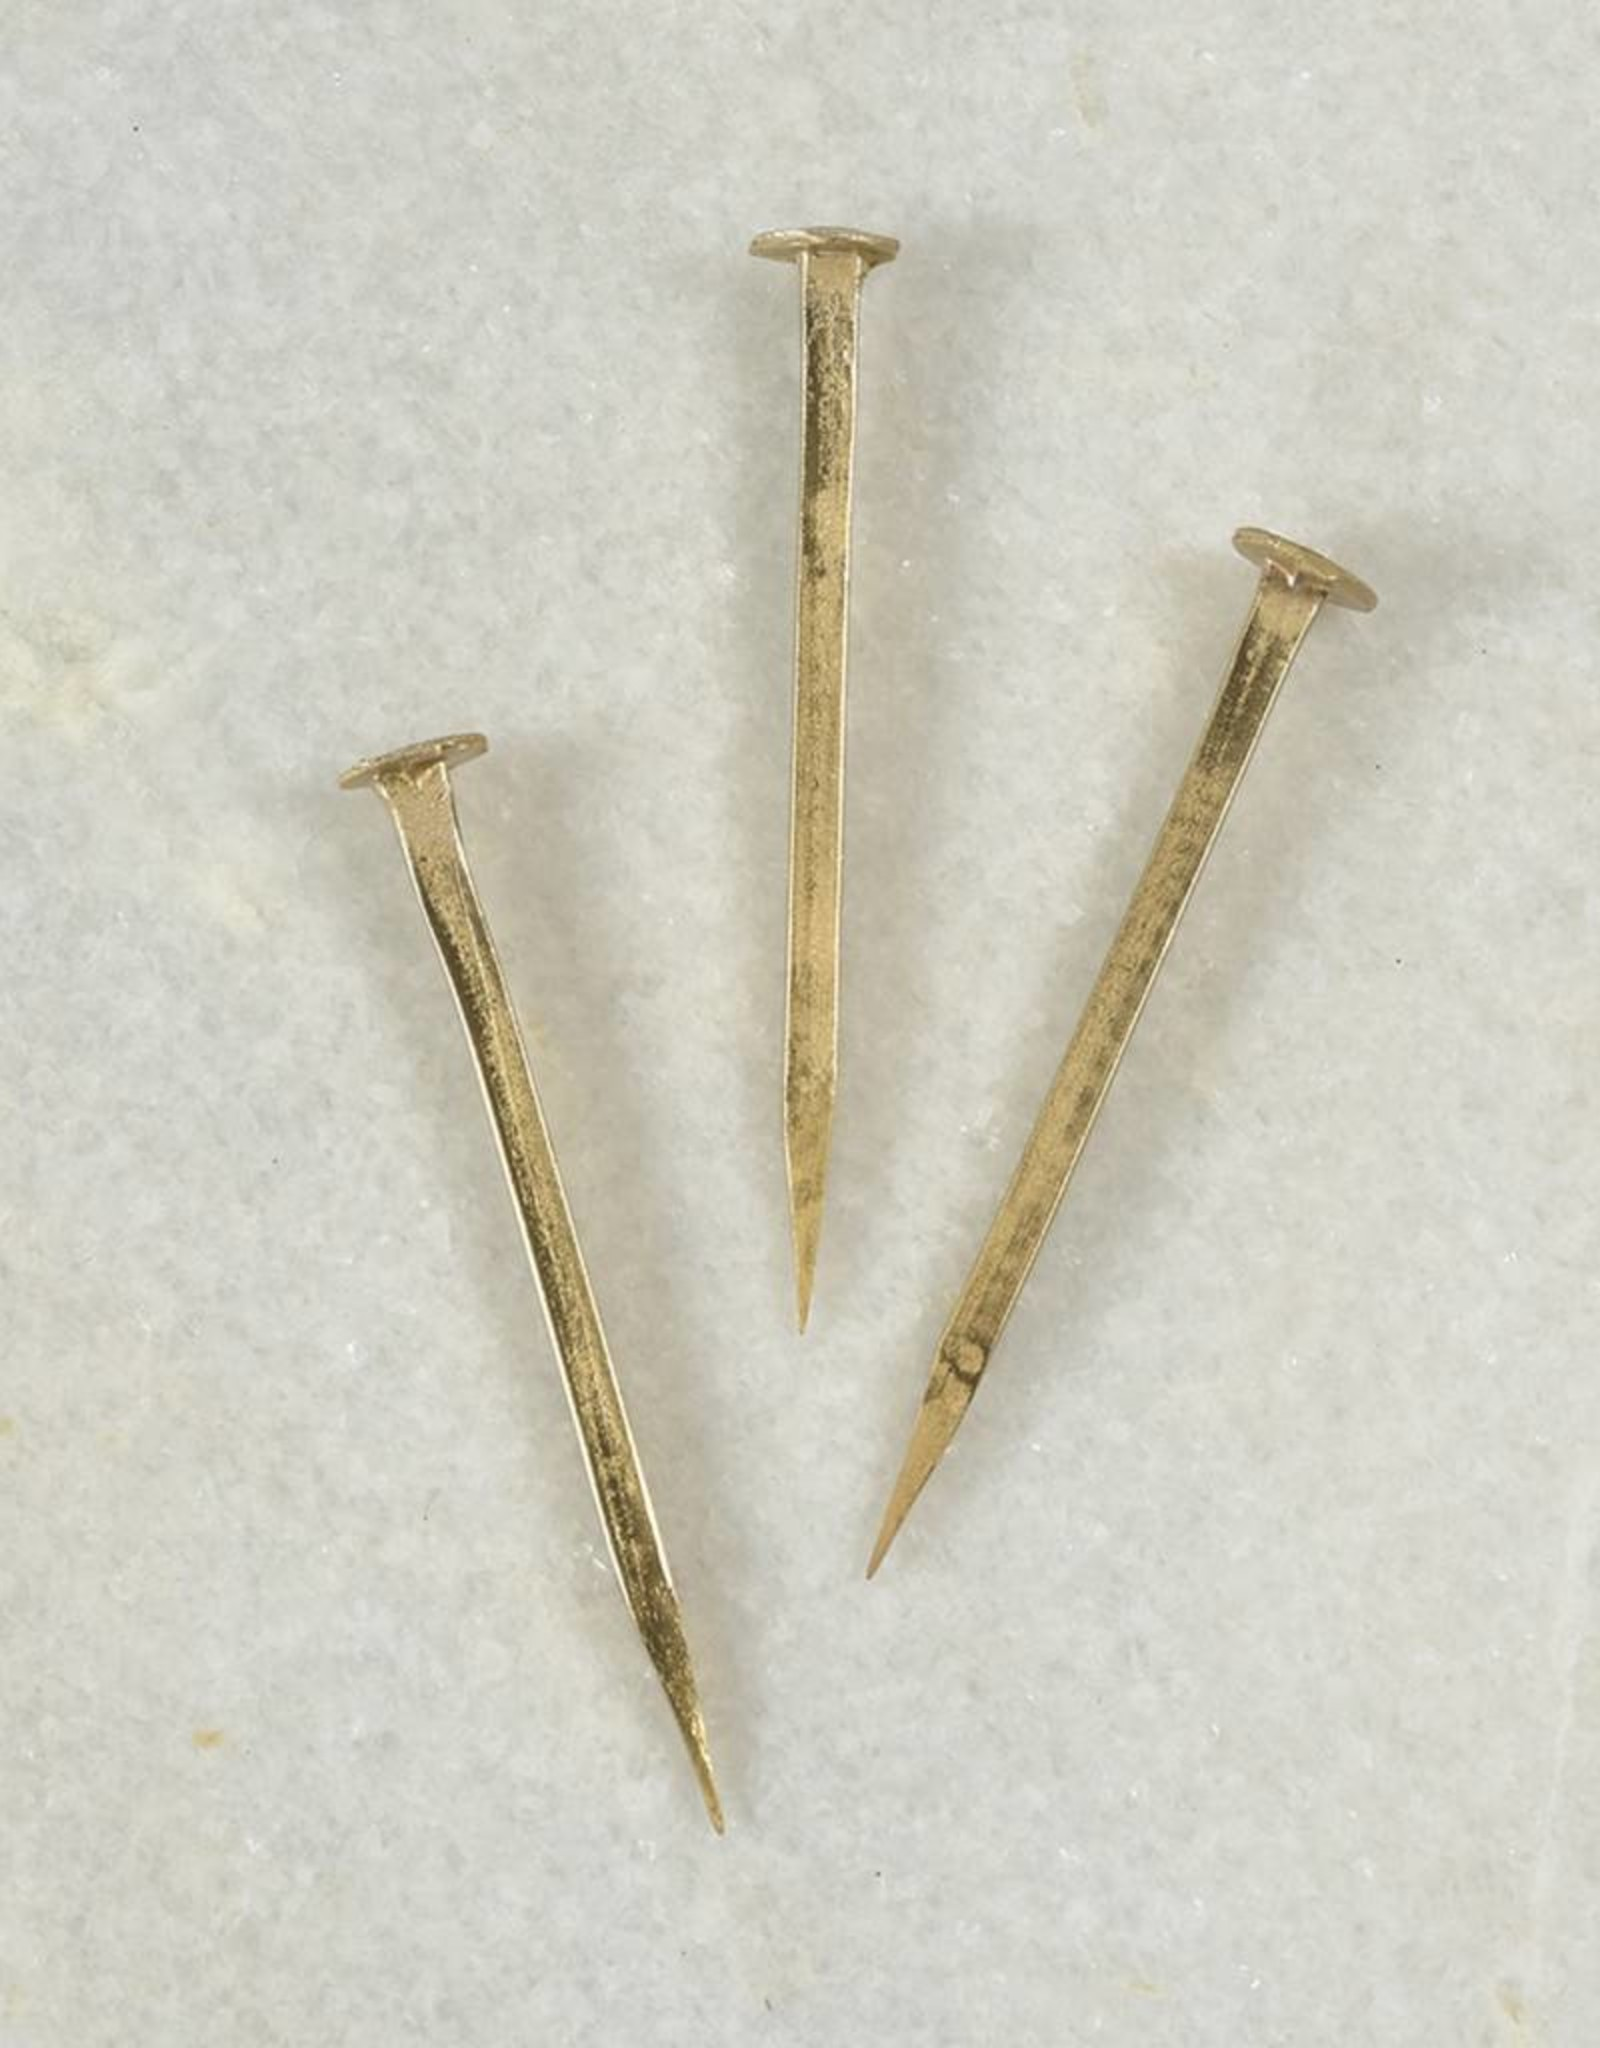 Forged Iron Nail - Large - Brass